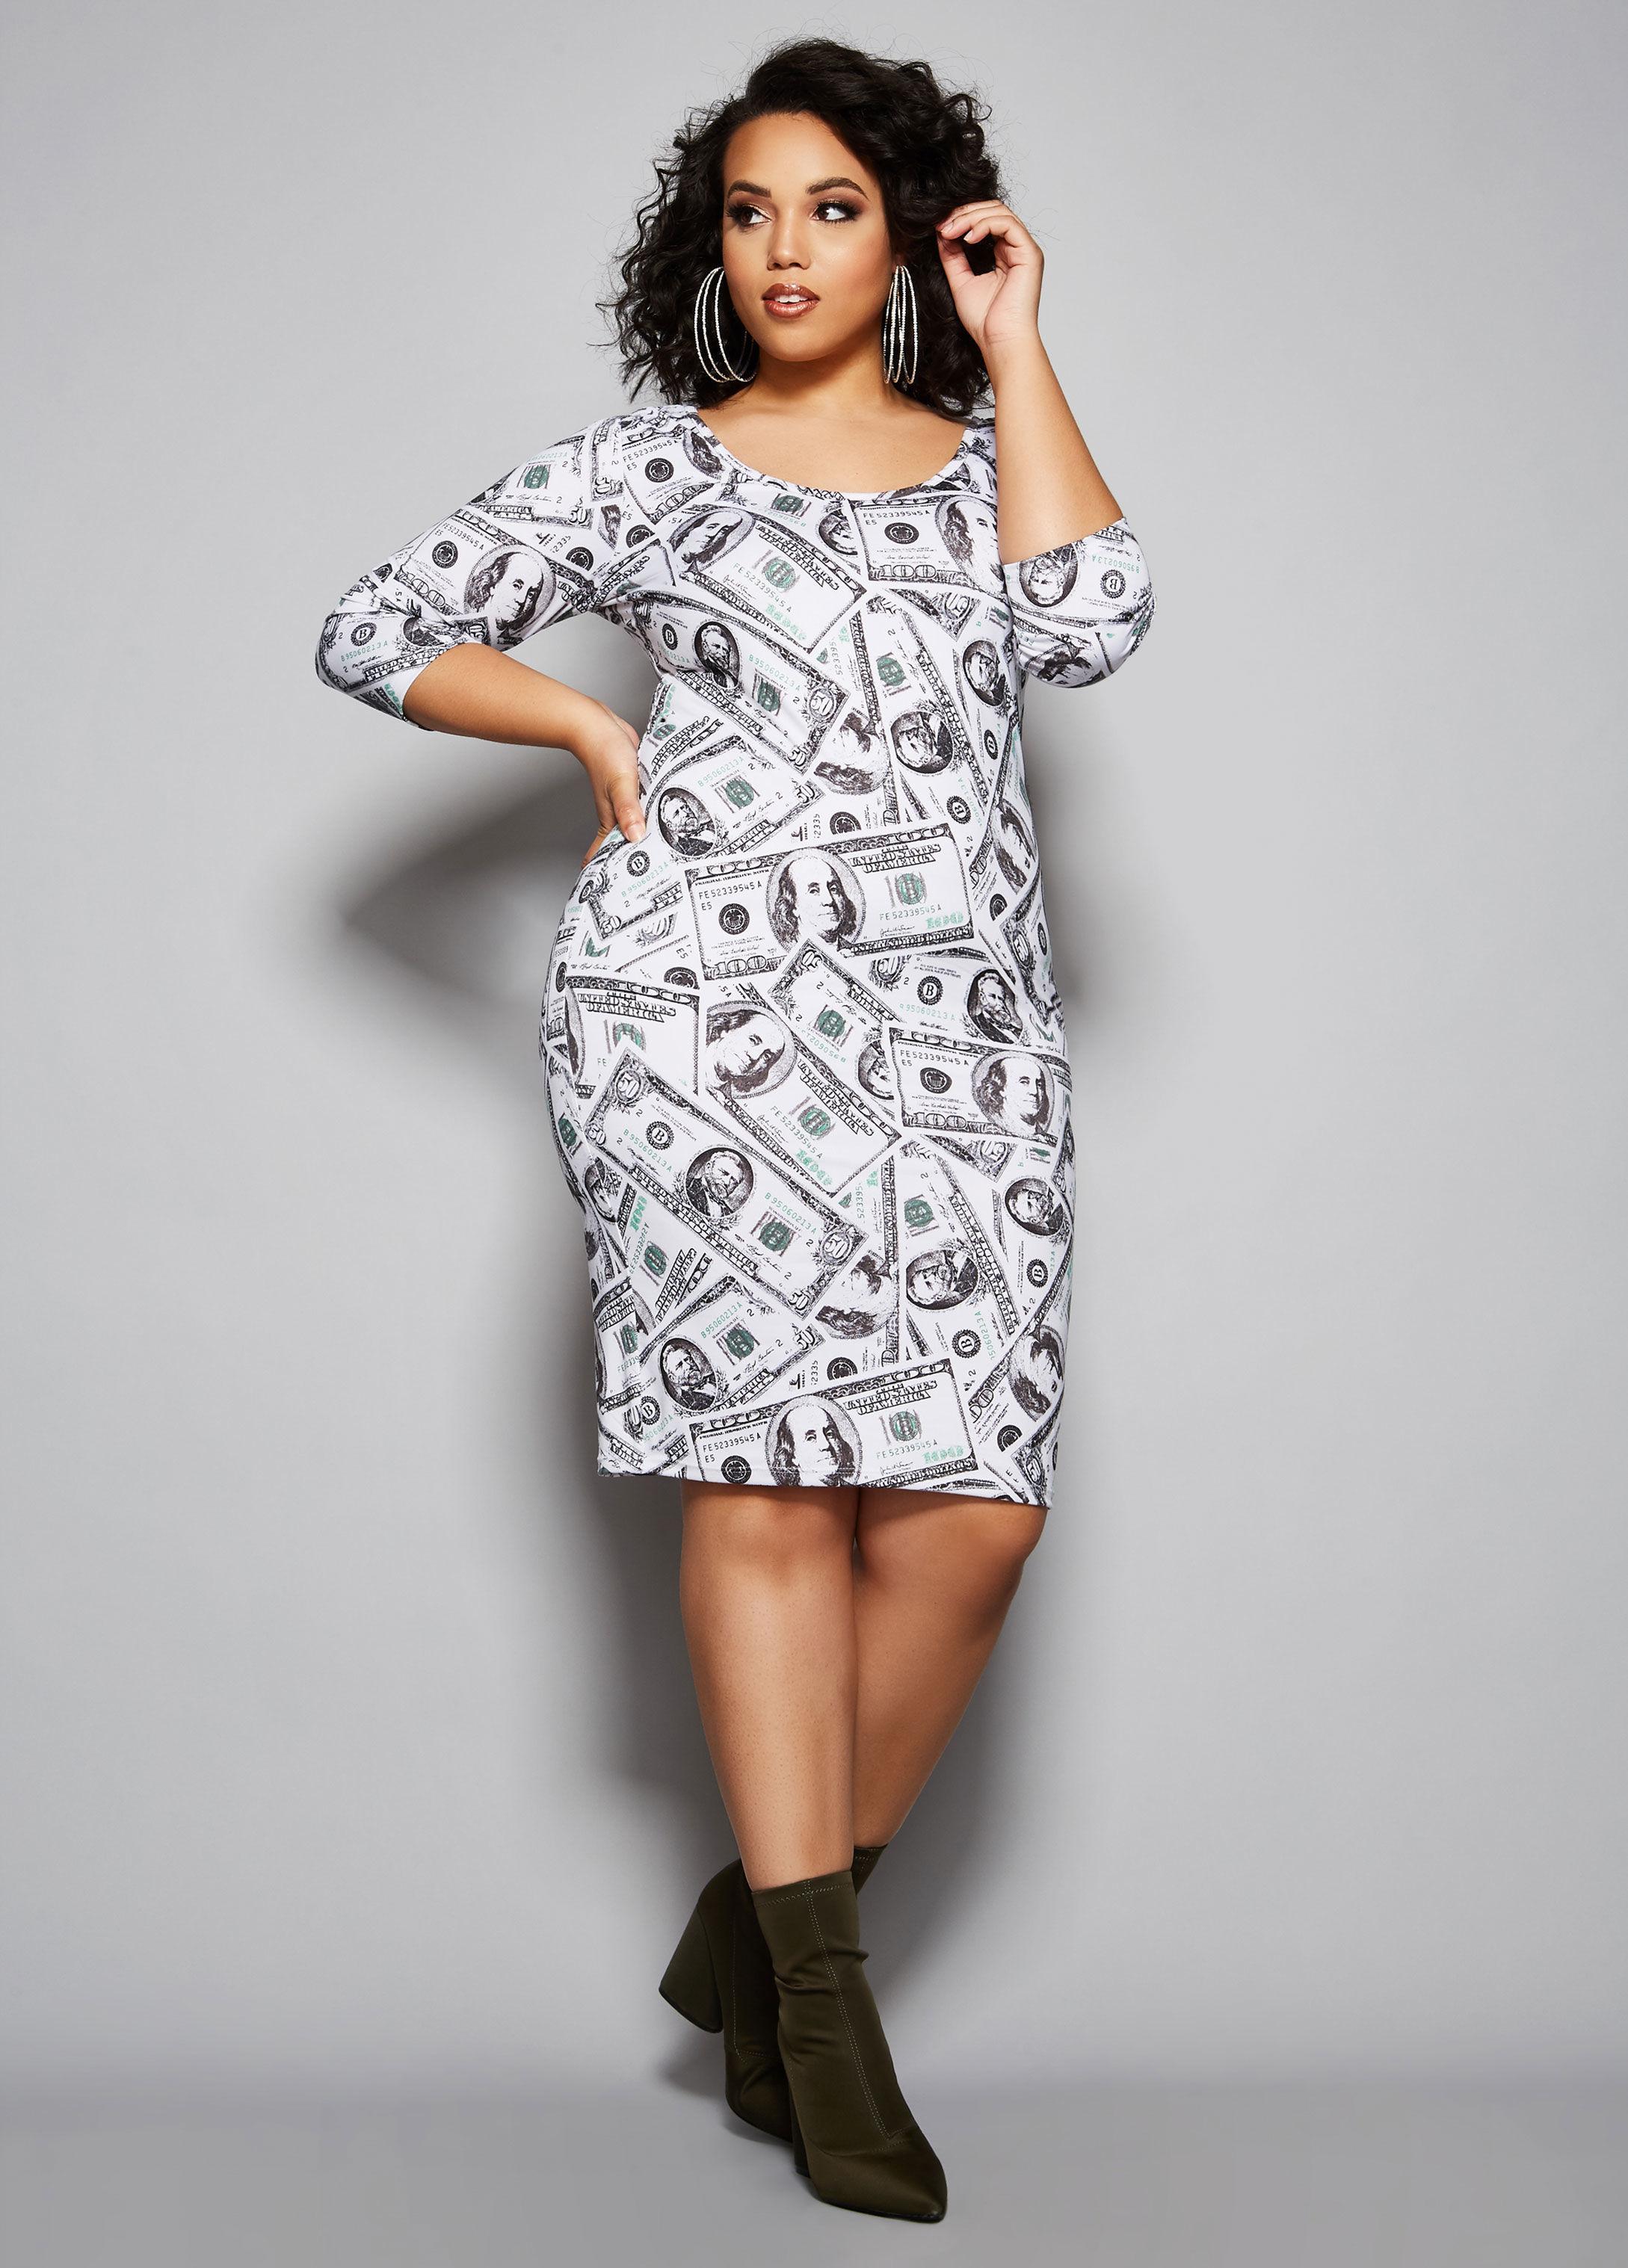 dbe459a2c61 Lyst - Ashley Stewart Plus Size The Money Dress in White